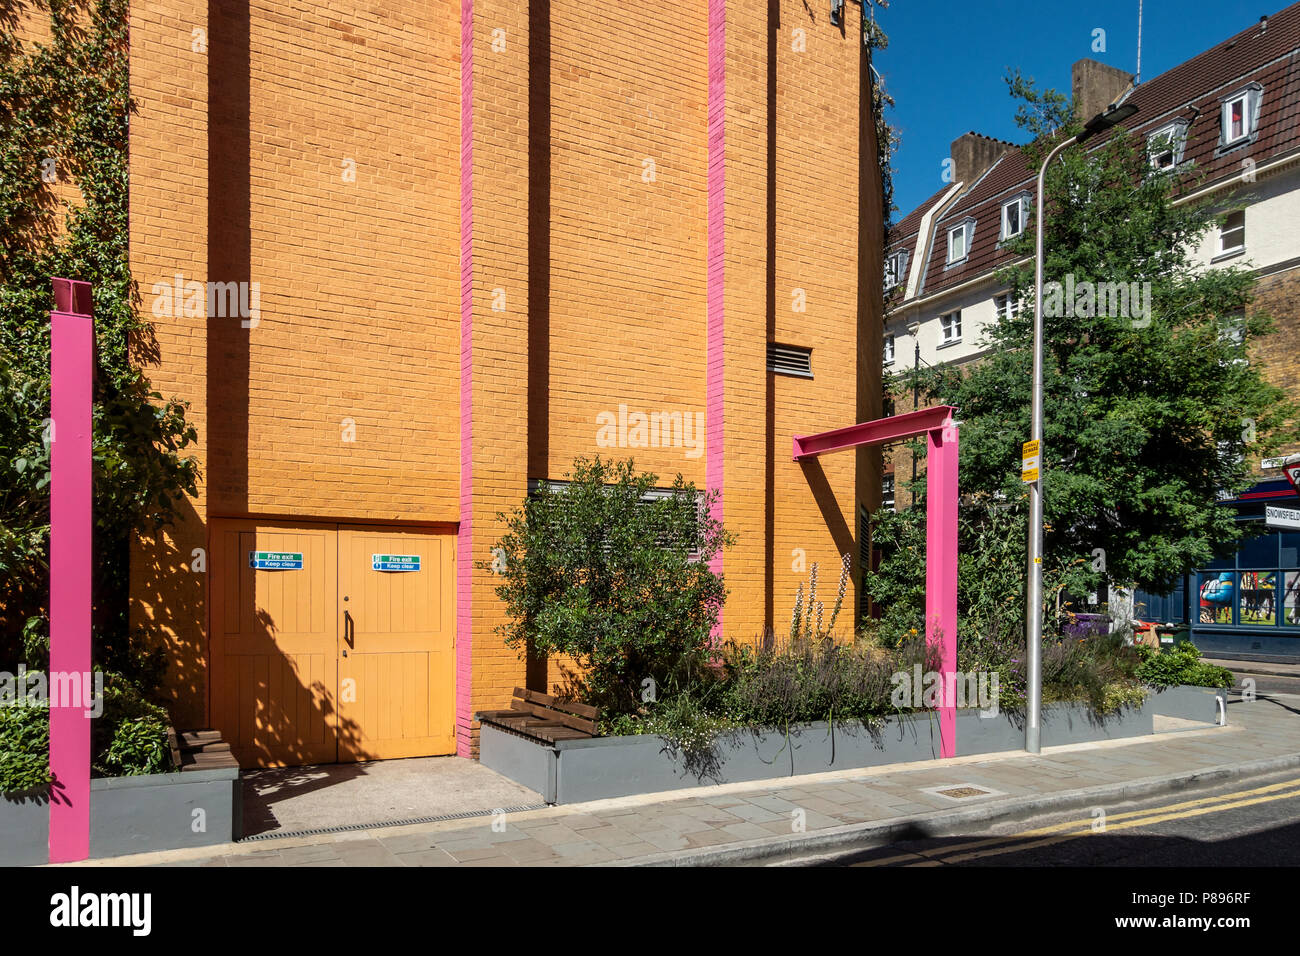 The Pocket Park, a pollinator-friendly garden, designed by Zandra Rhodes and Joe Swift at the Greenwood Theatre, Southwark, London, England, UK - Stock Image